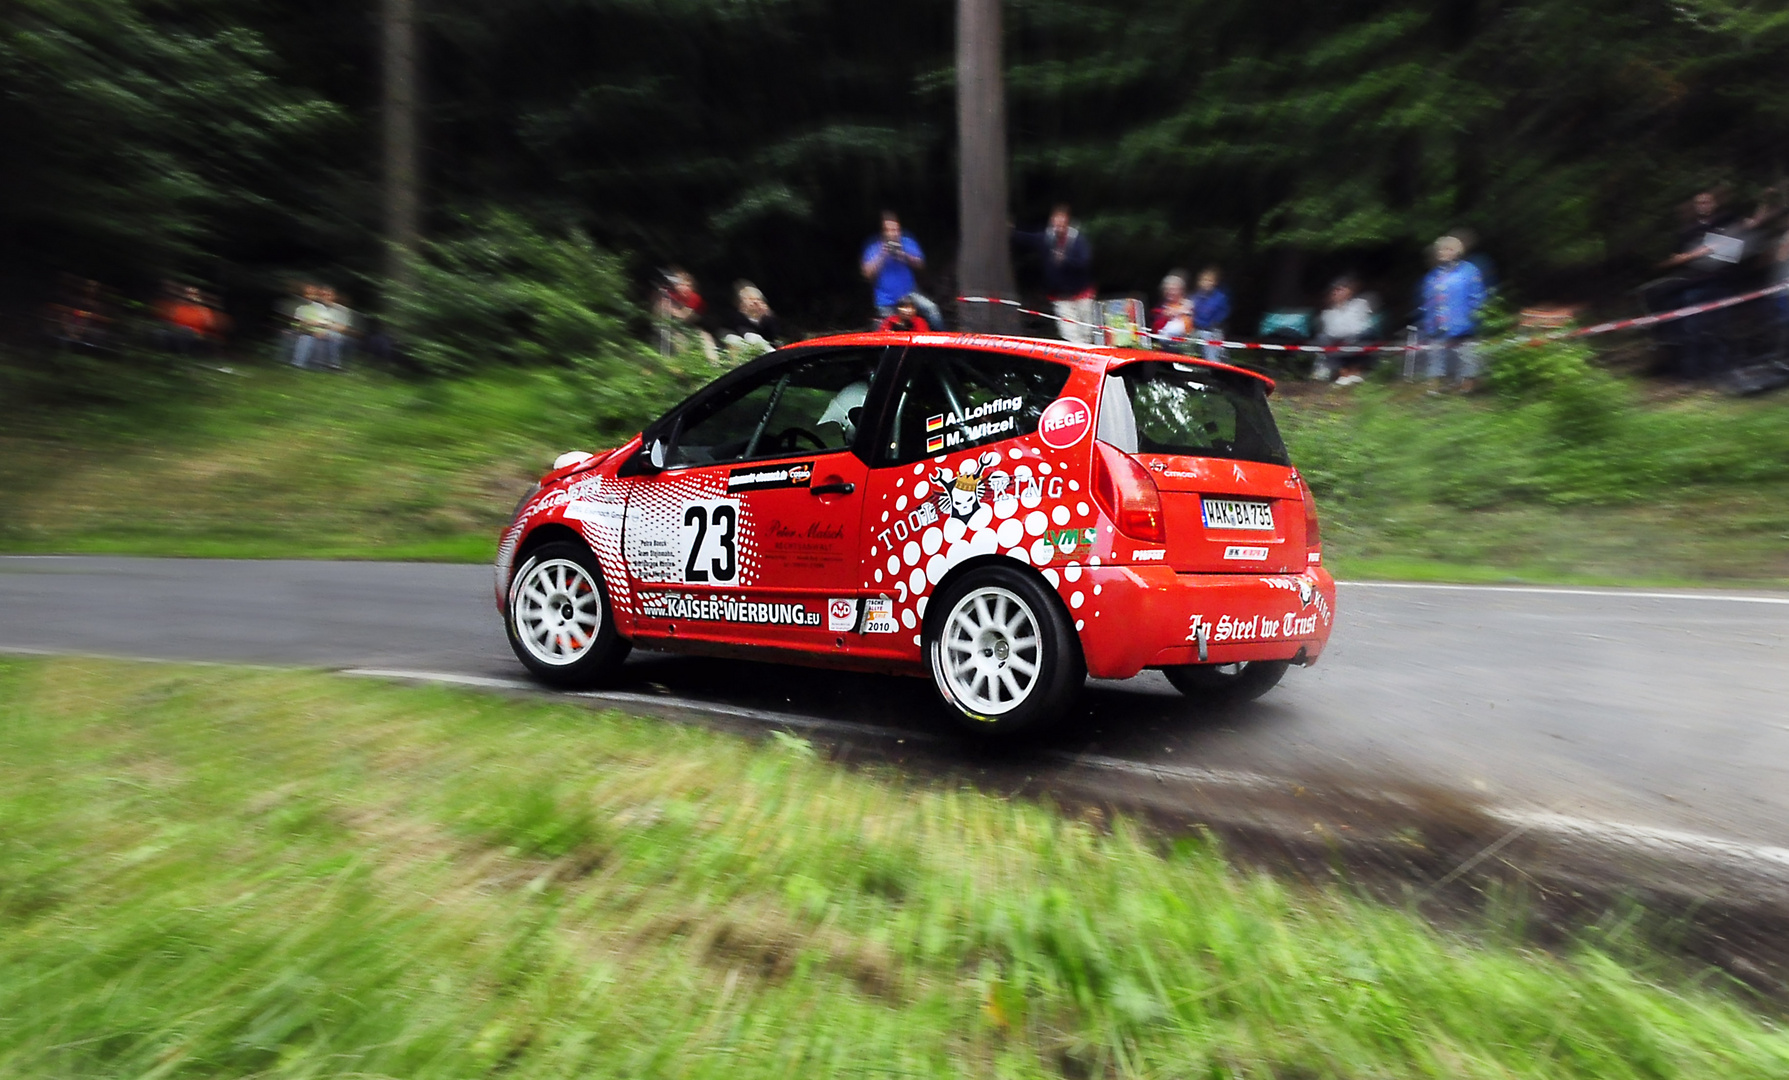 Rallye Wartburg 2010